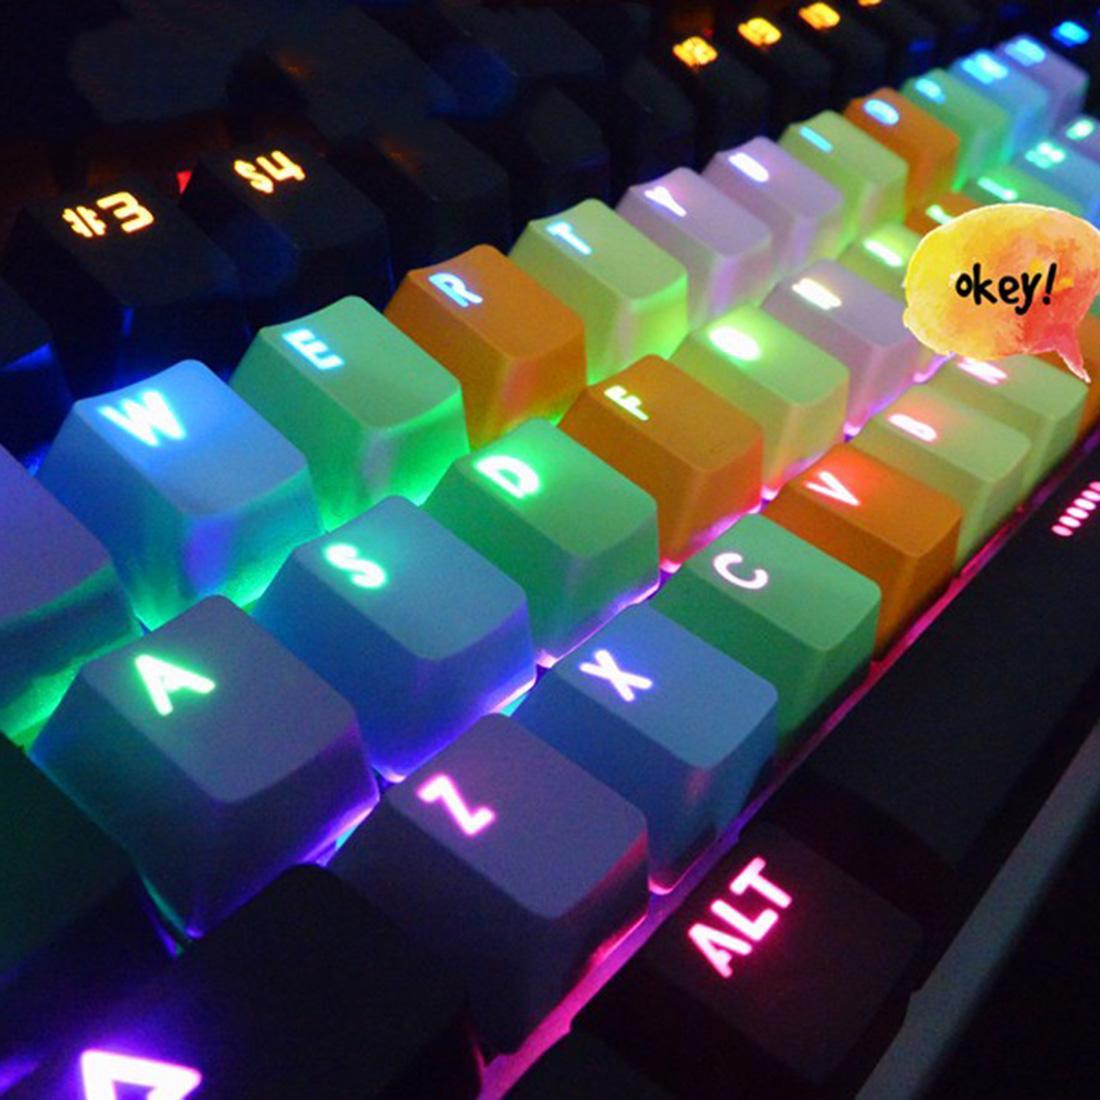 Etmakit Backlight PBT 37keys Double Shot Translucidus Backlight Backlit Rainbow Keycaps for Mechanical Keyboard - intl